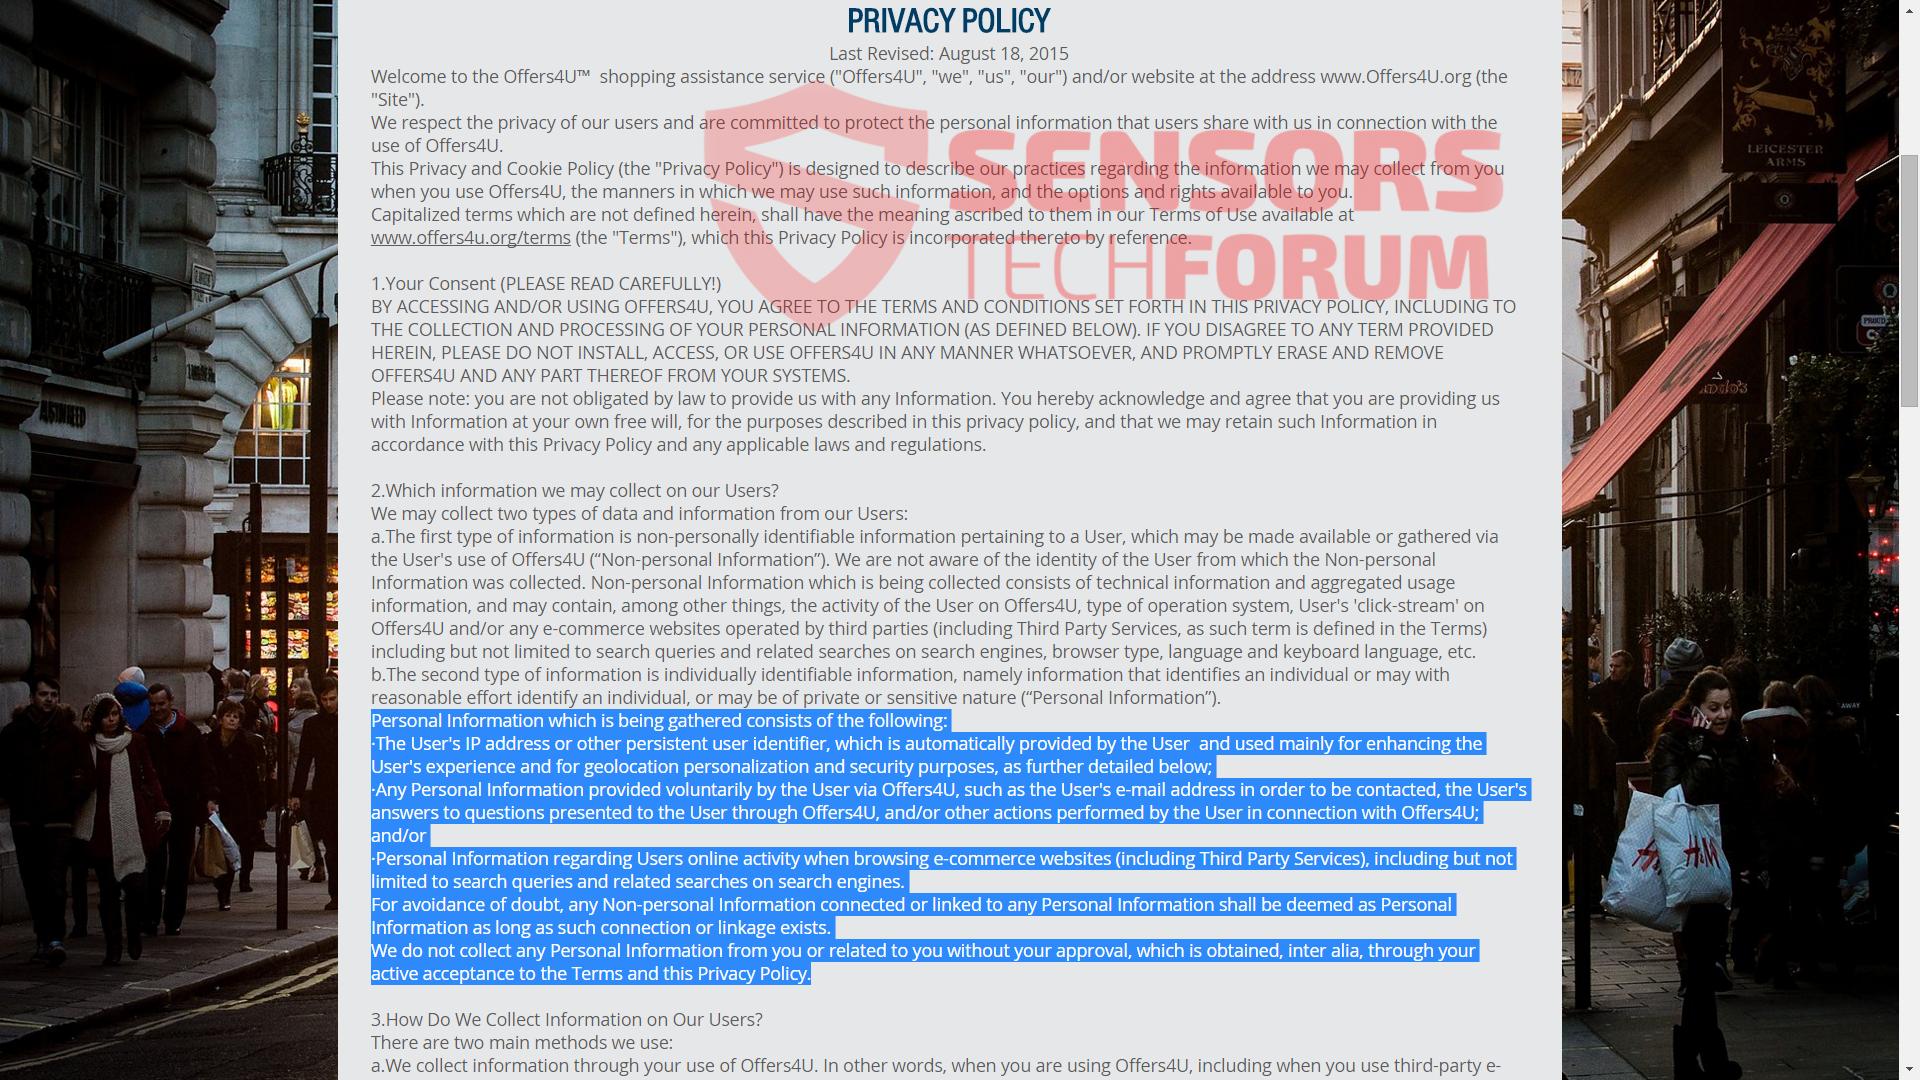 SensorsTechForum-offers4u-offers-4u-official site-privacy-policy